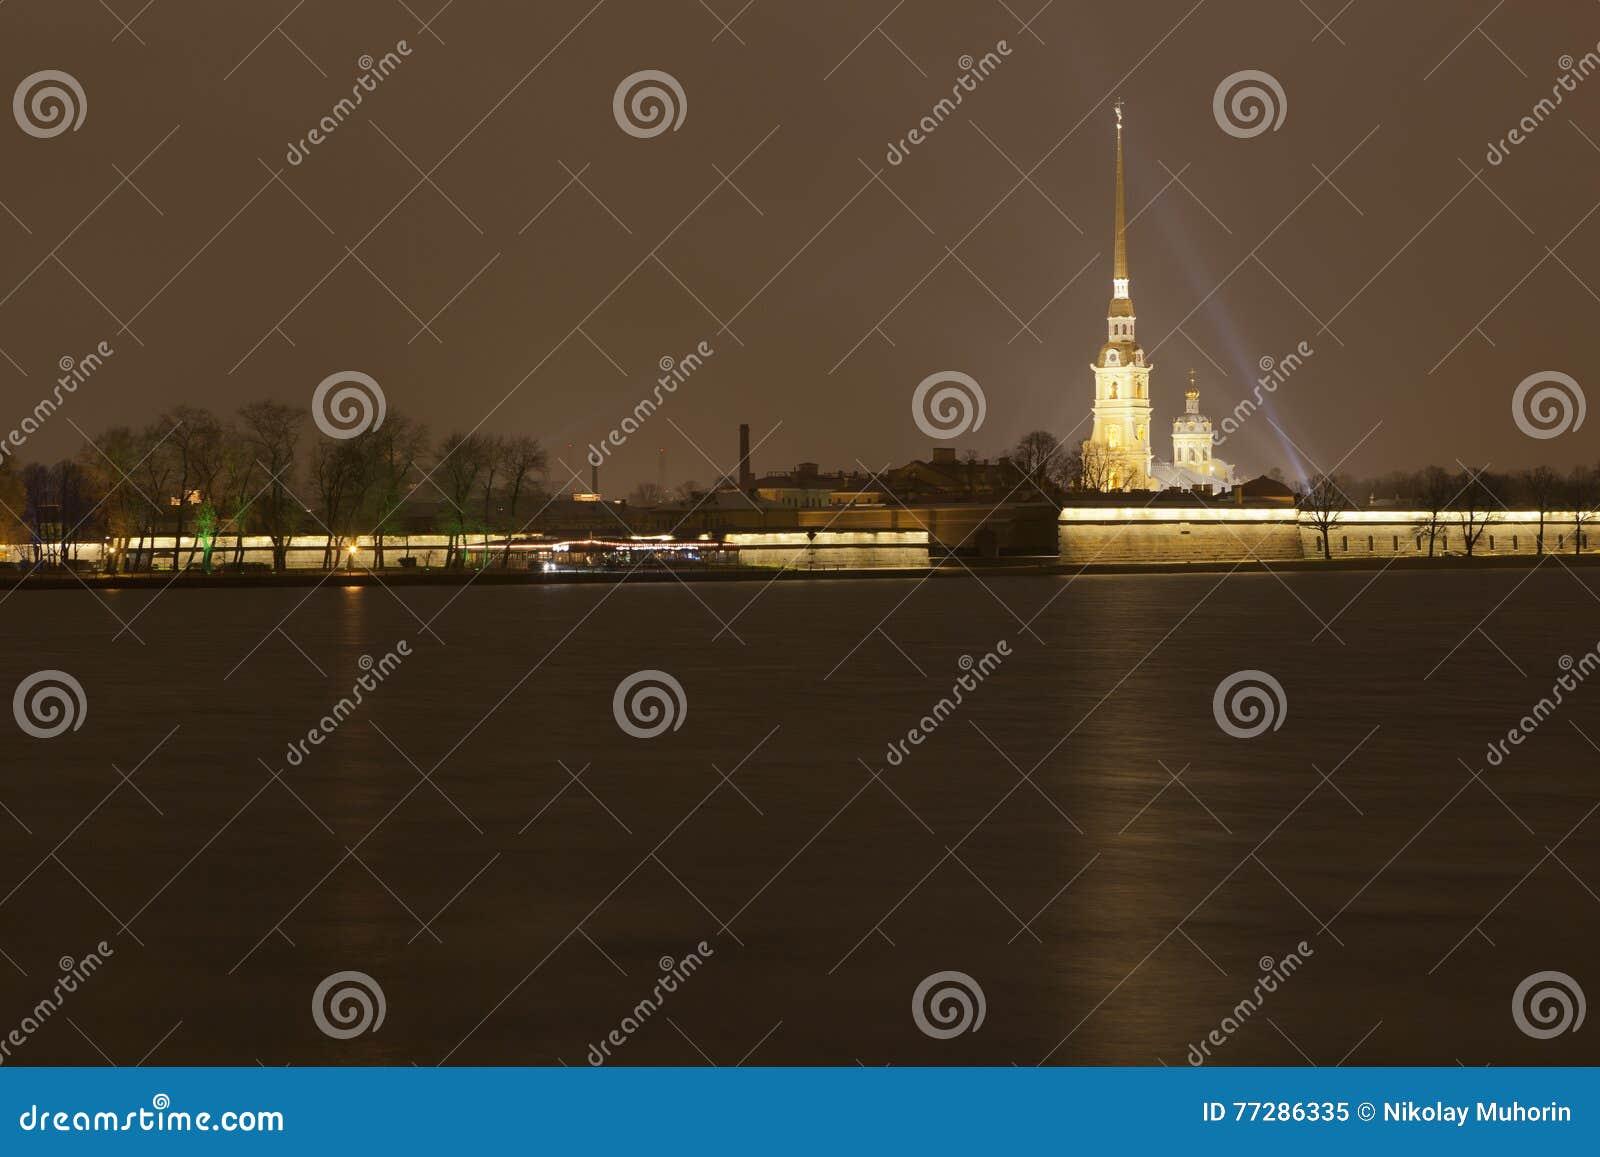 Vista de la fortaleza de Petravlosk en la noche St Petersburg, Rusia